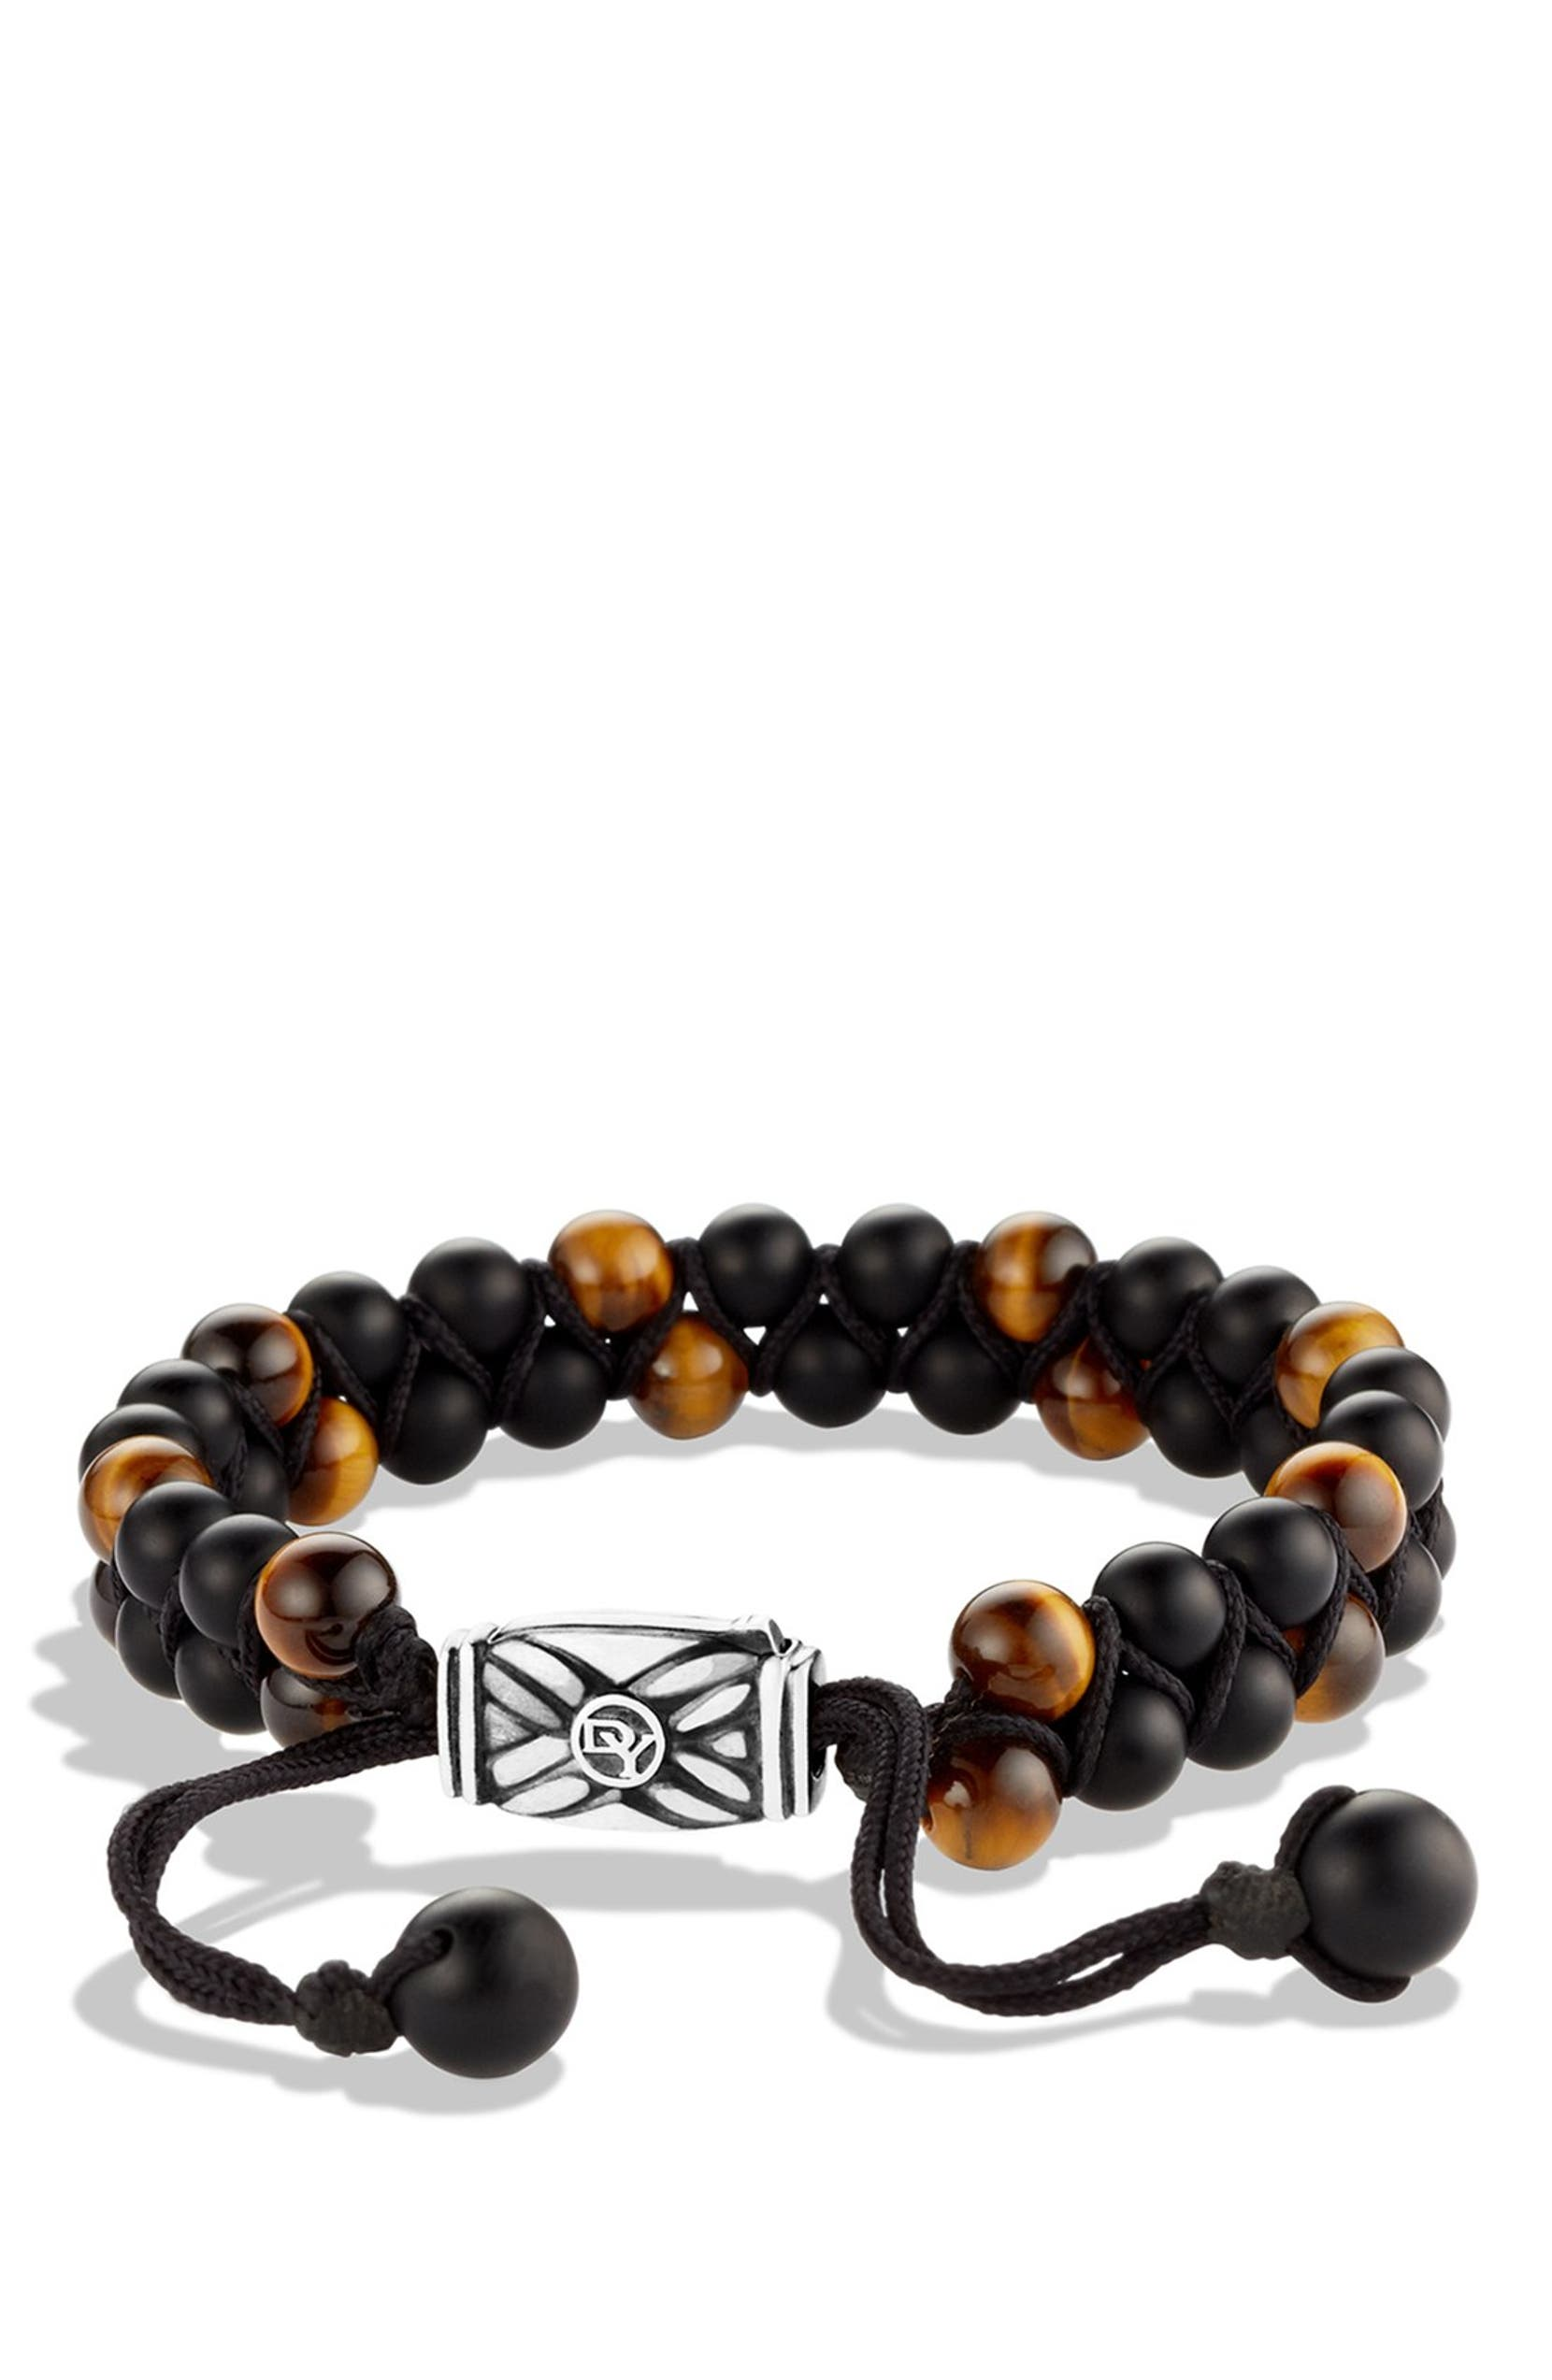 1d6a1cffb3bd0 David Yurman 'Spiritual Beads' Two-Row Bracelet with Black Onyx and ...